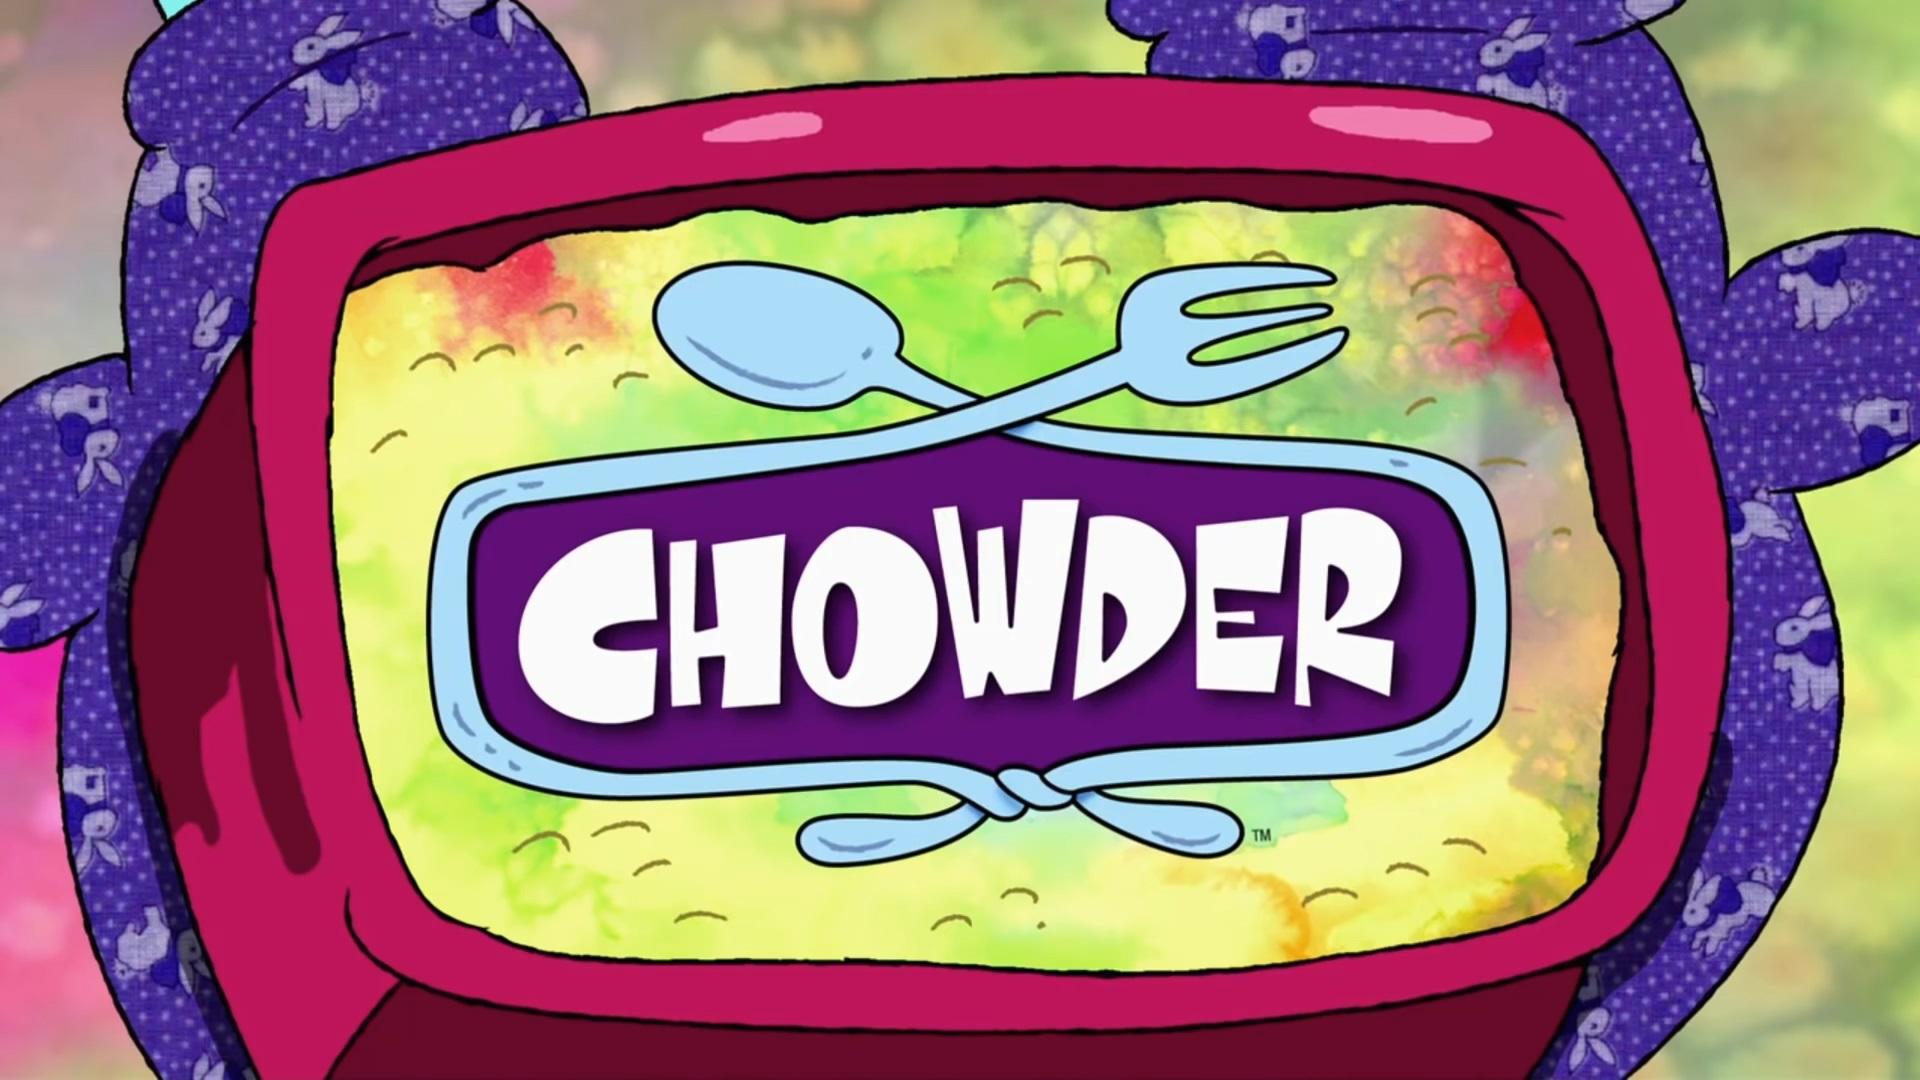 Chowder/Other